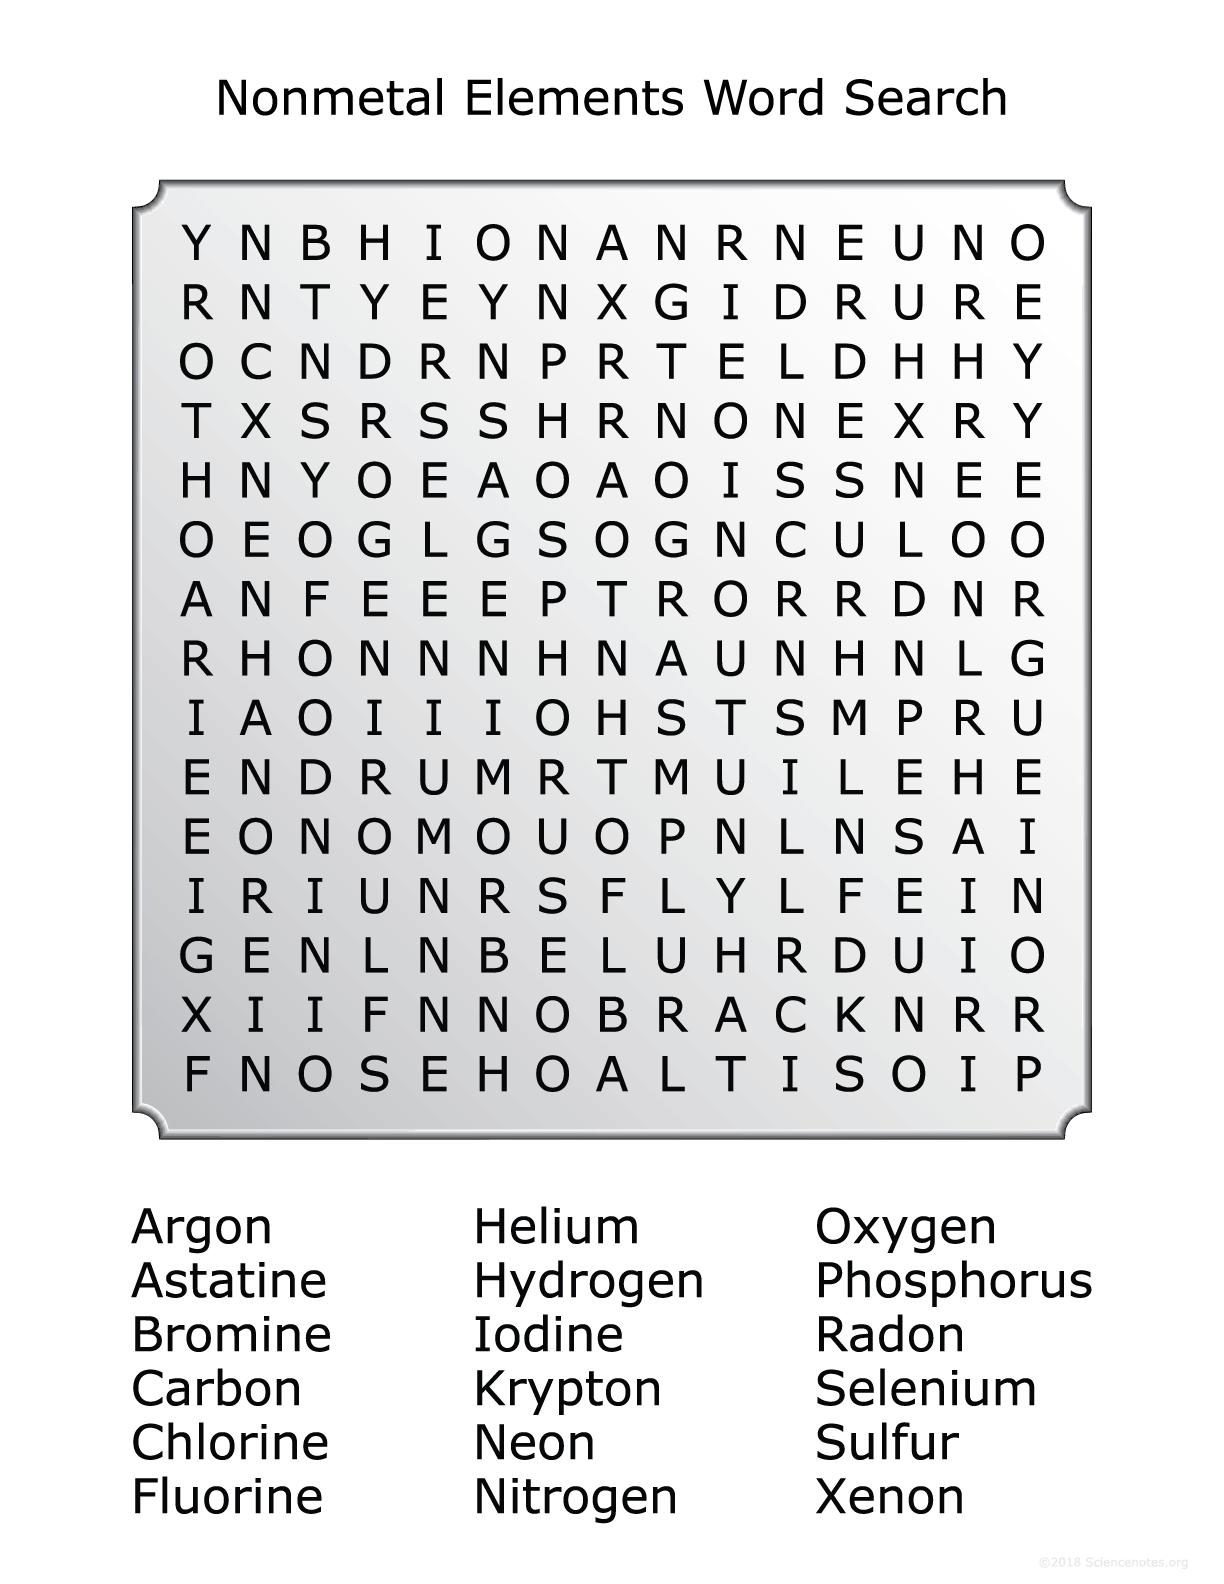 Periodic Table Metals And Nonmetals Crossword Puzzle